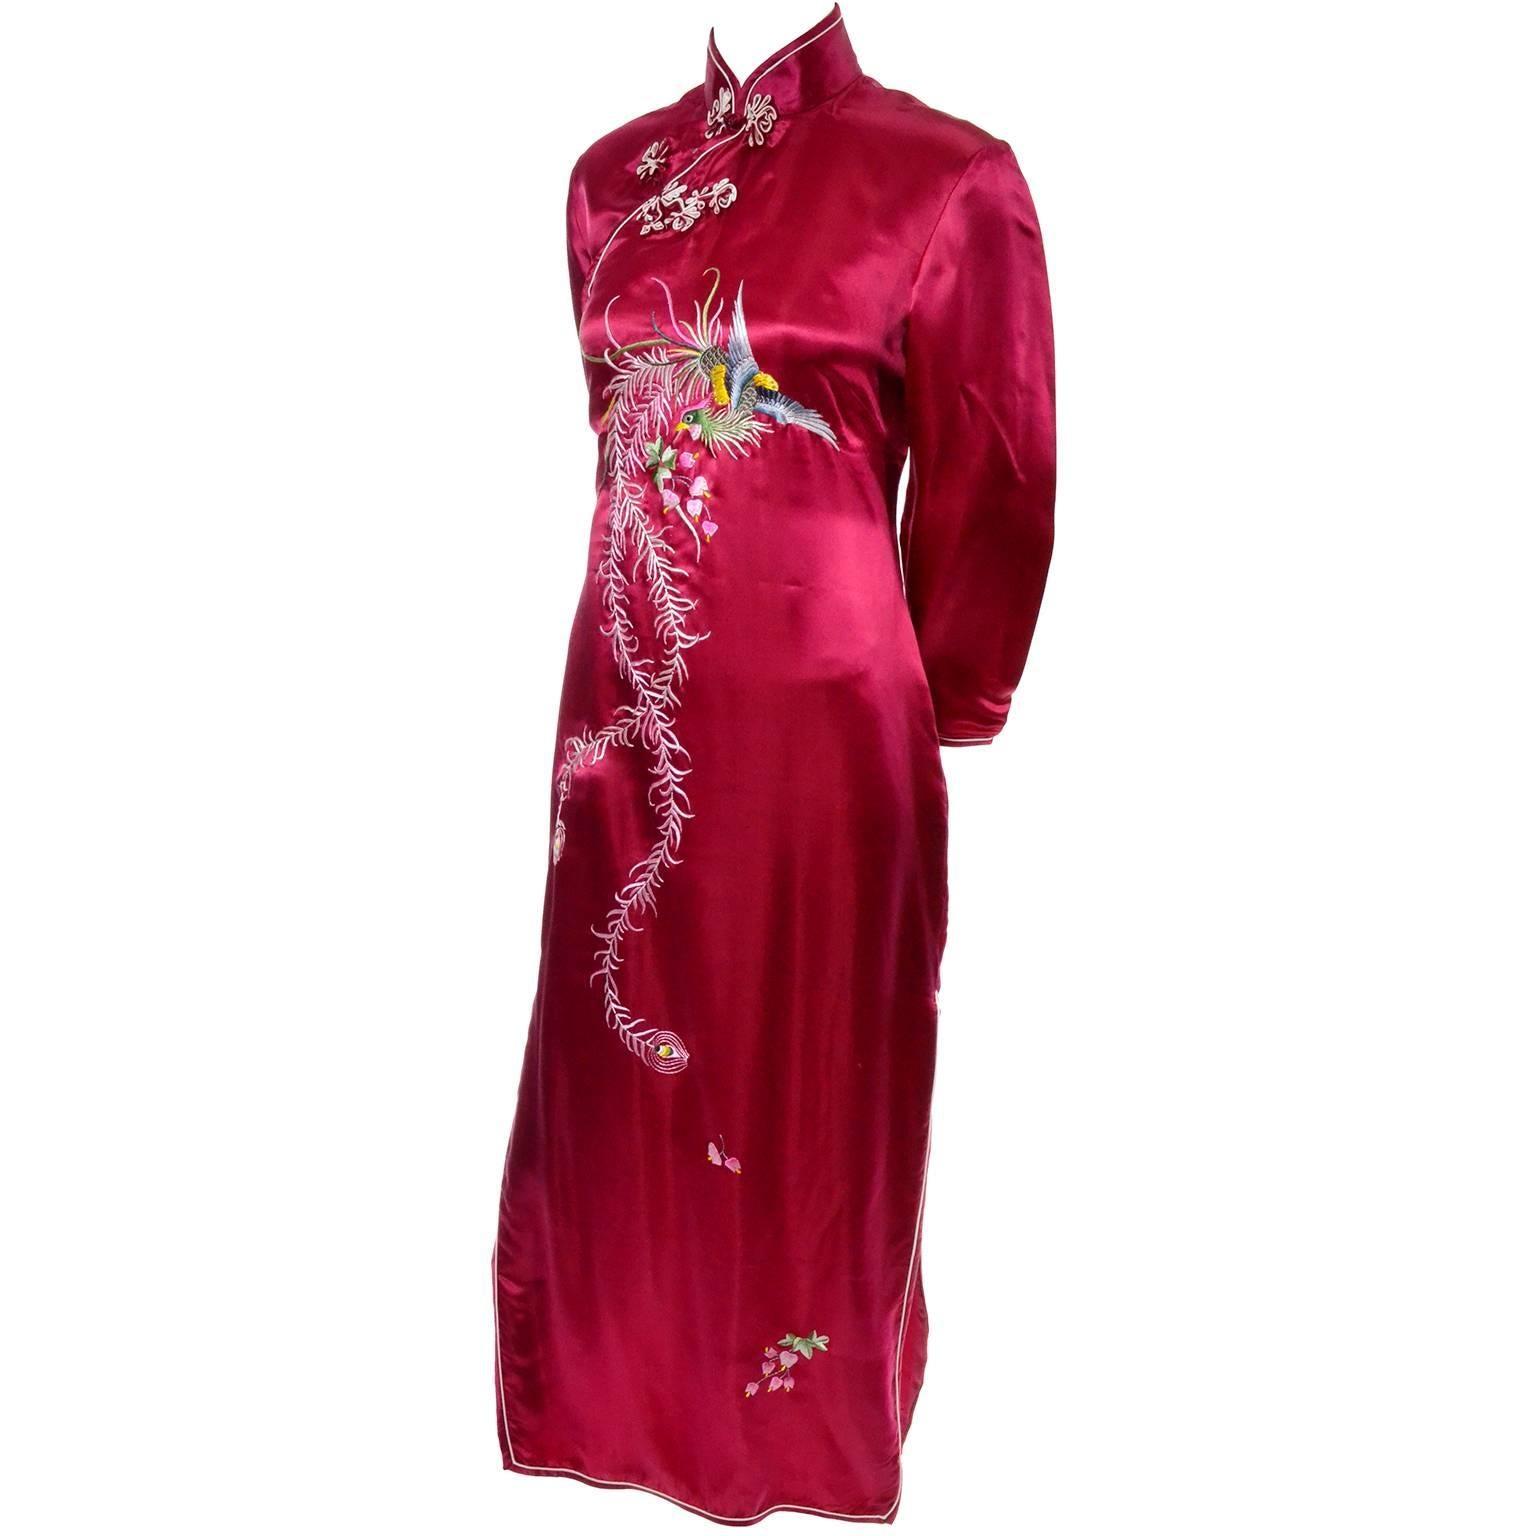 540c54625 Chinese Vintage Red Silk Cheongsam Dress Fine Embroidery Peacock Bird Motif  8/10 at 1stdibs